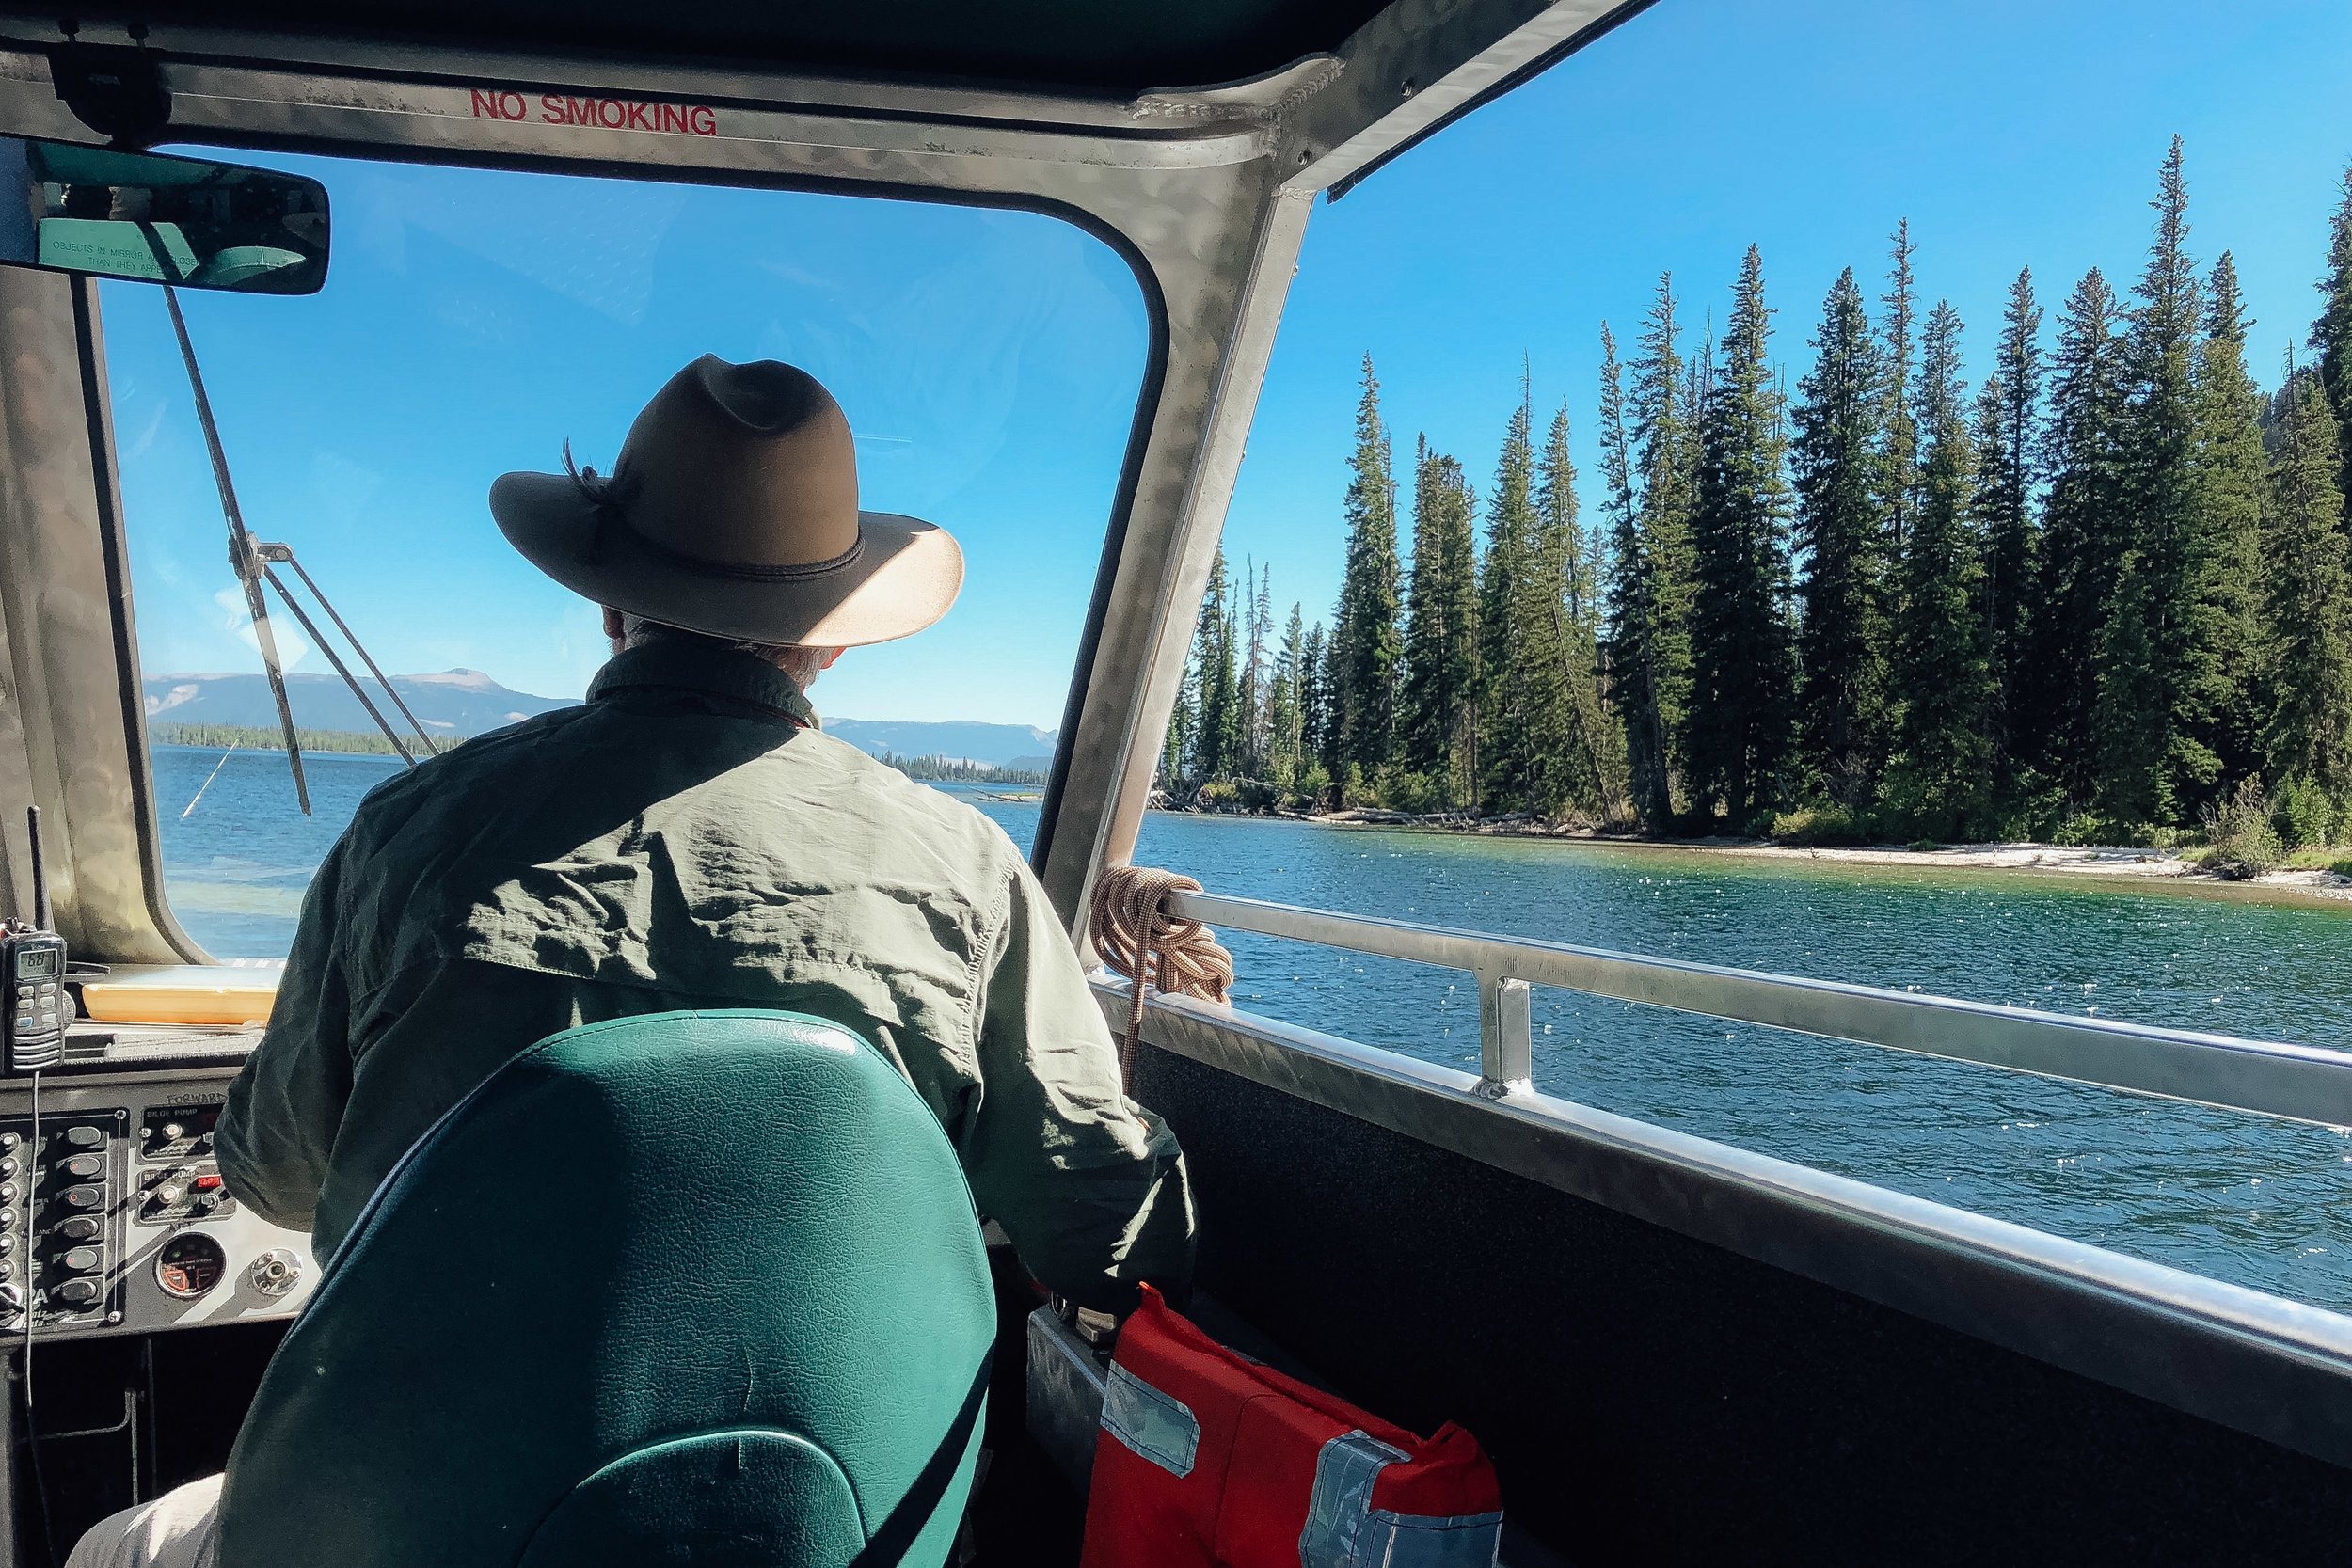 The boat ride across  Jenny Lake  to the Cascade Trail head.